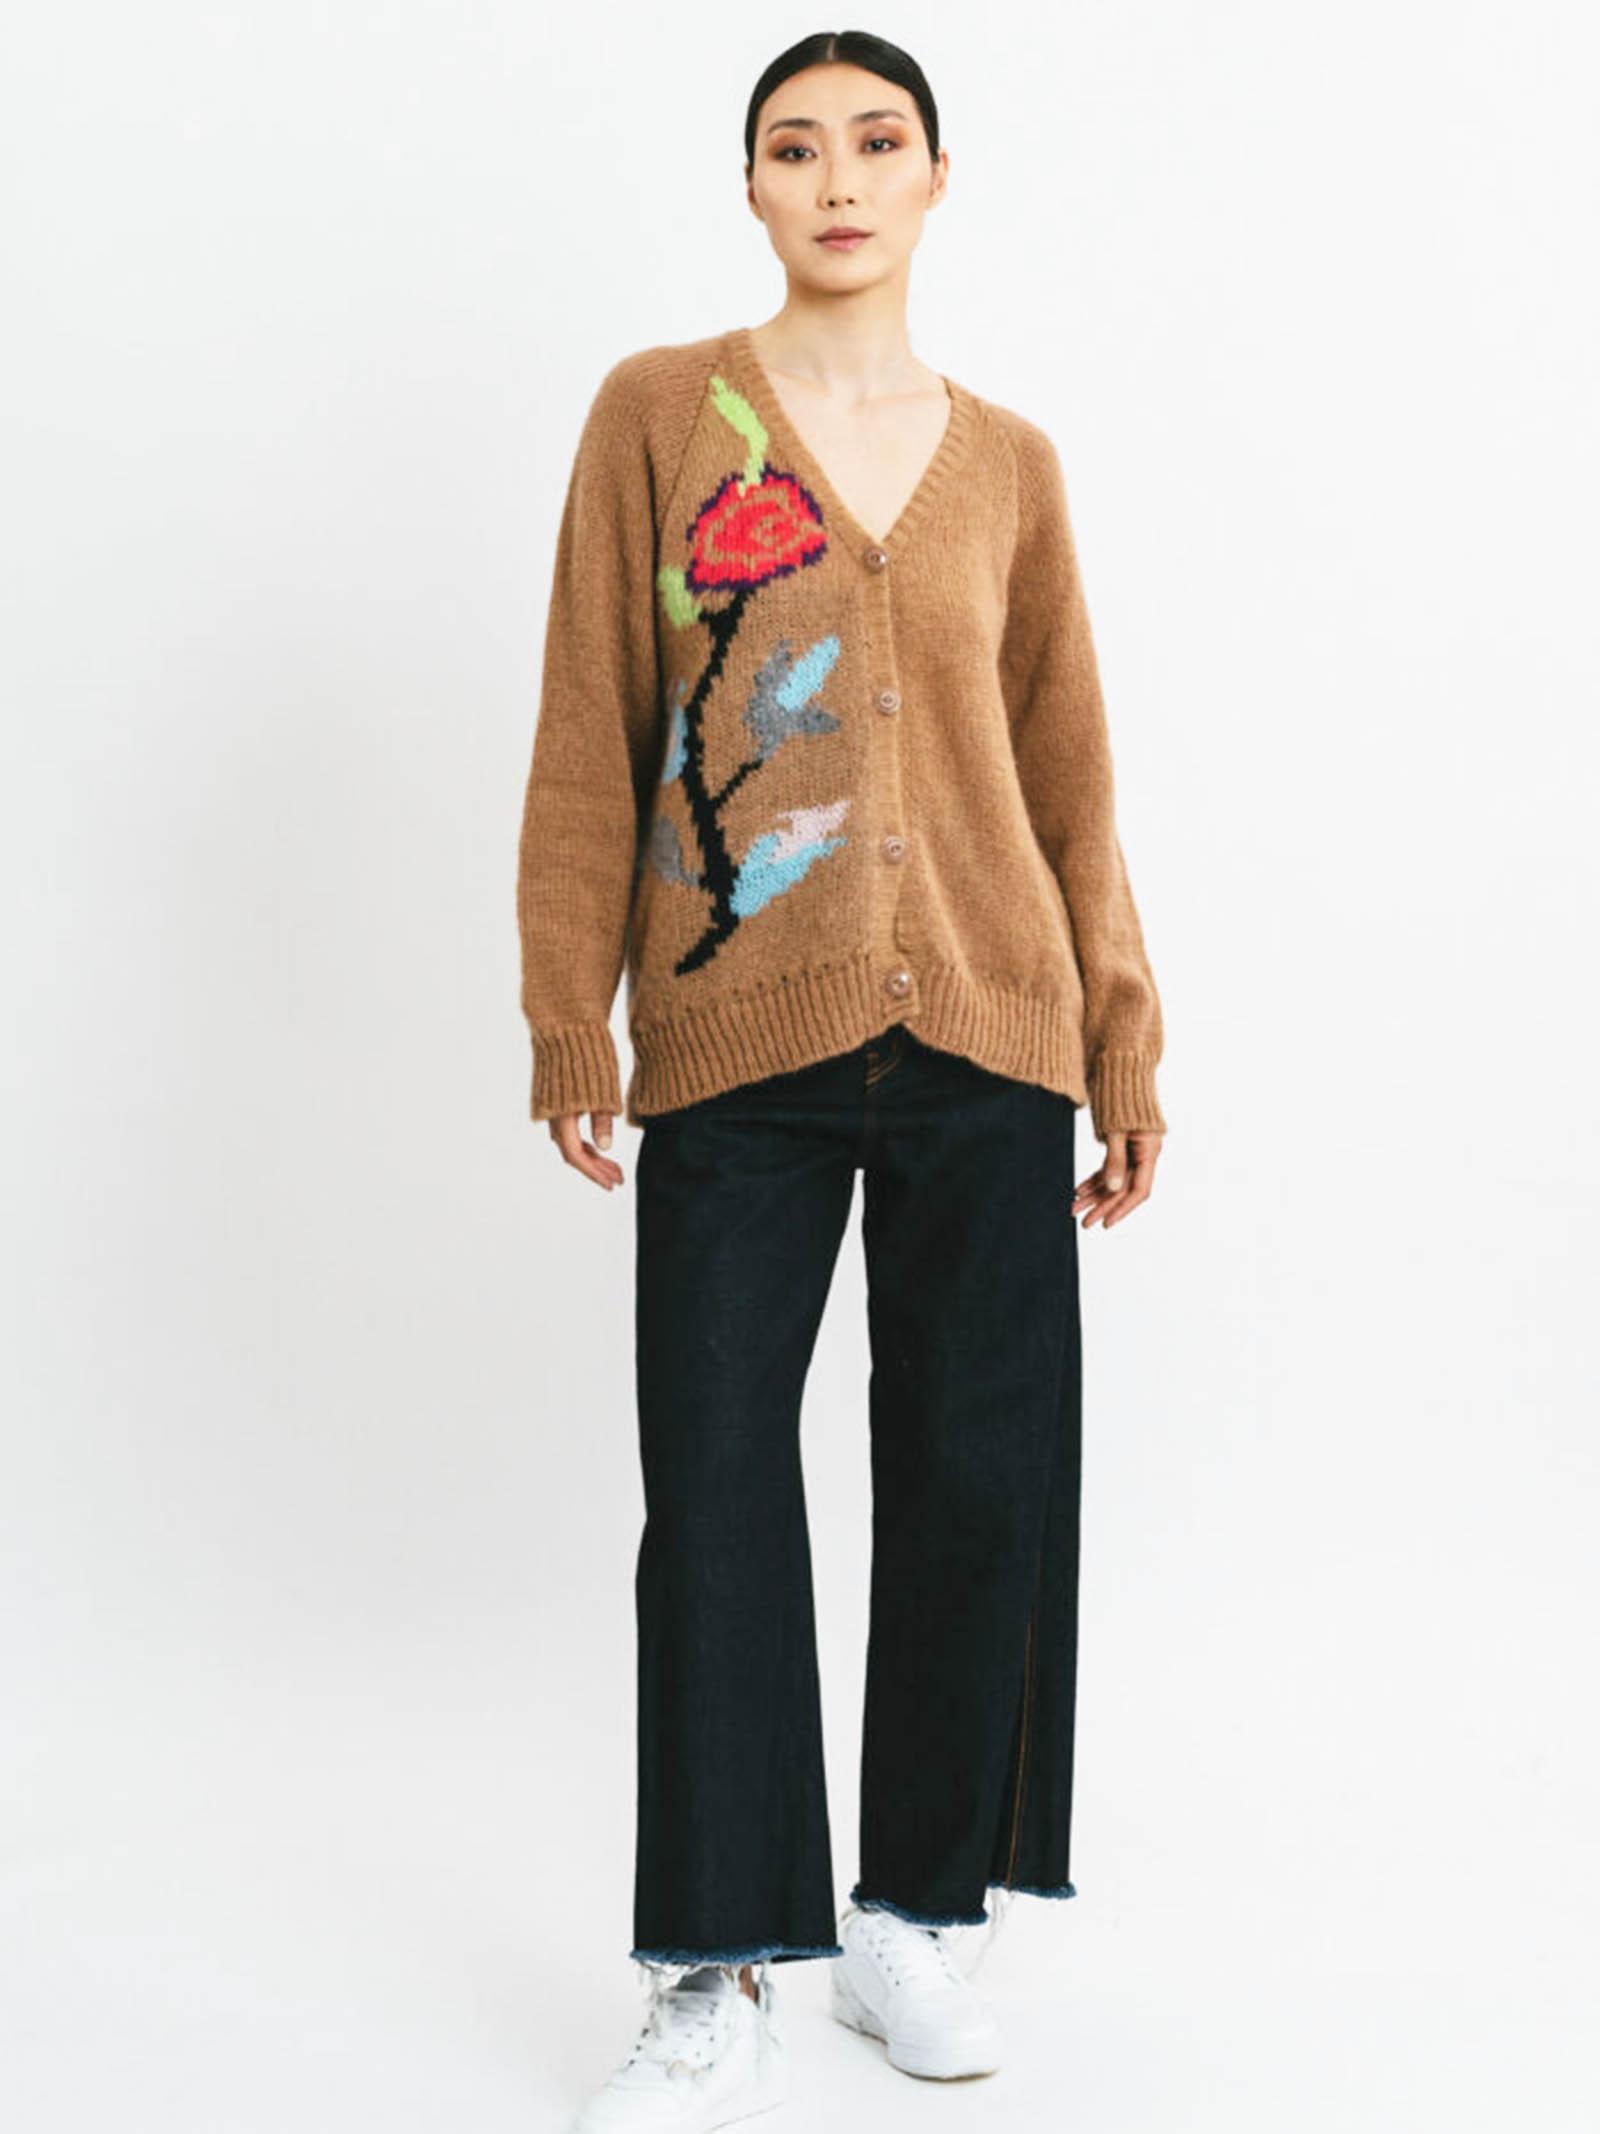 Abbigliamento Donna Cardigan in Lana Mohair Cammello con Ricarmi e Scollo Profondo Pink Memories | Maglieria | 1111624